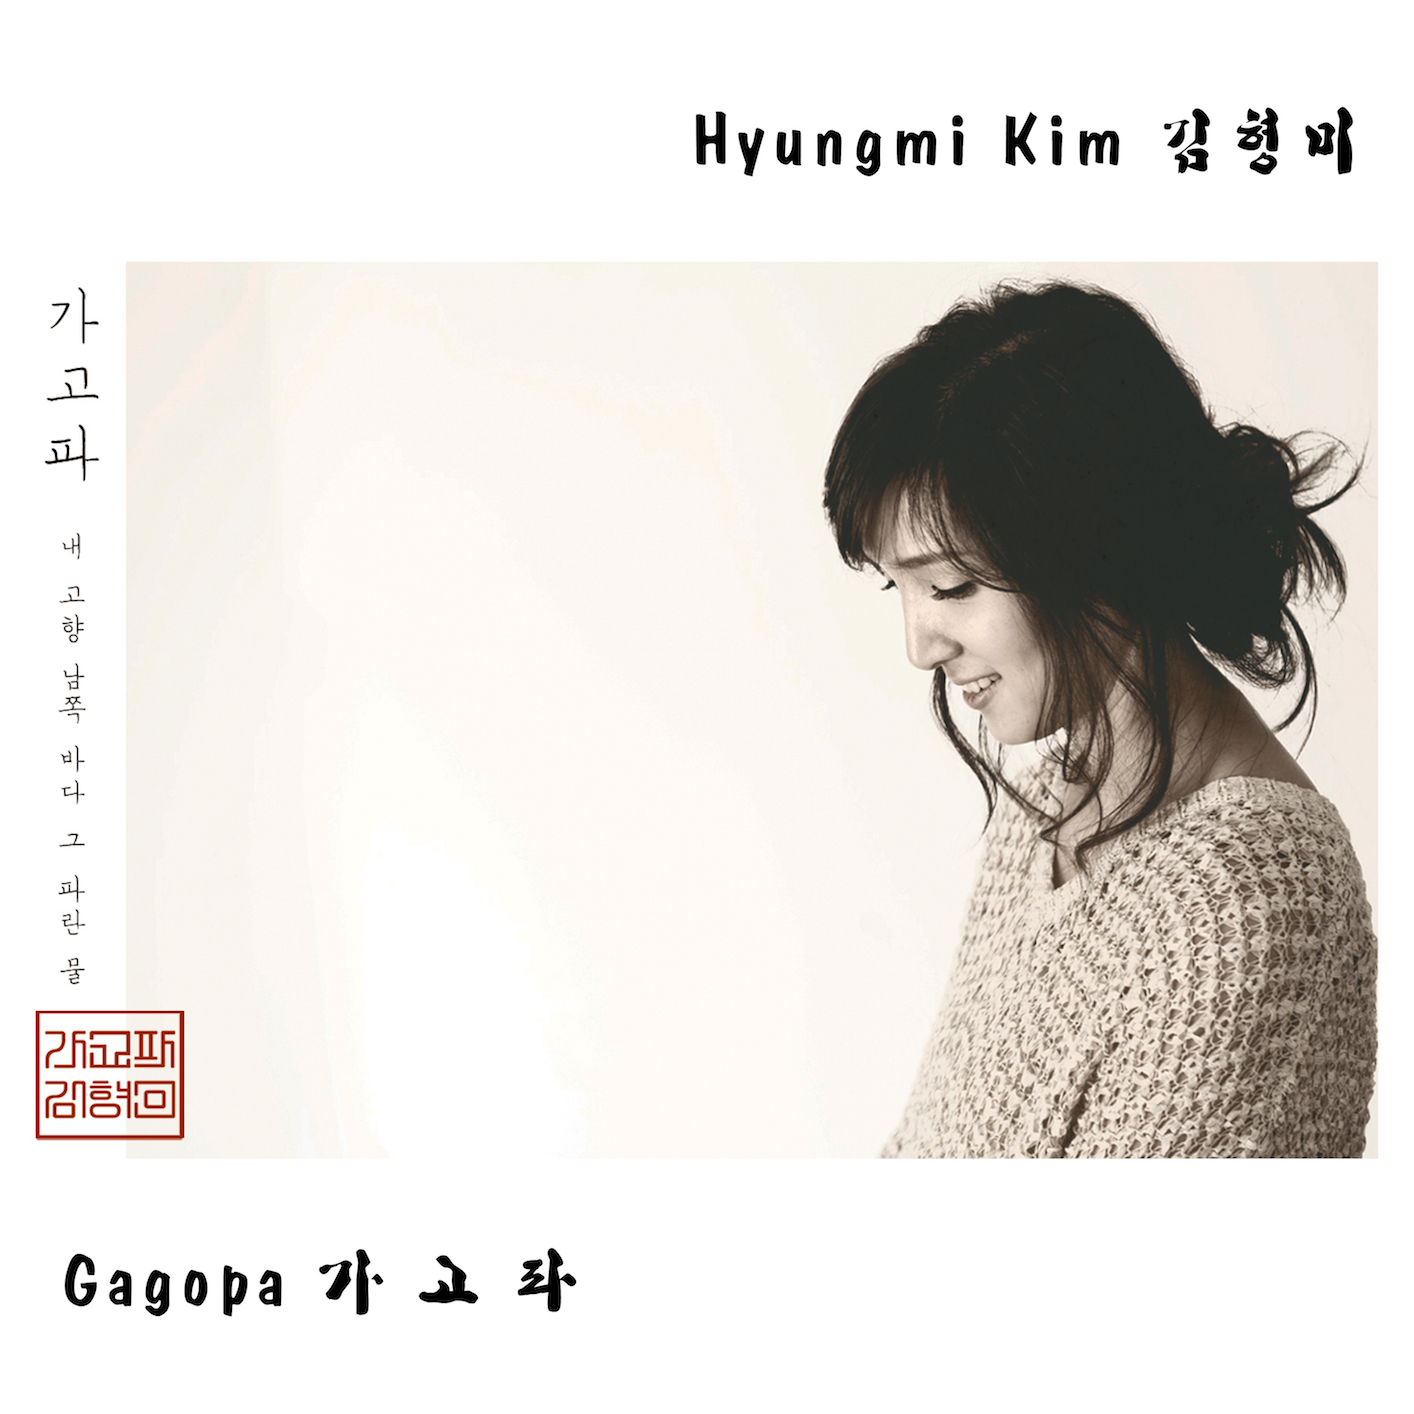 Hyungmi Kim – Gagopa (錄音室母帶 24/48) [hifitrack FLAC 24bit/48kHz]